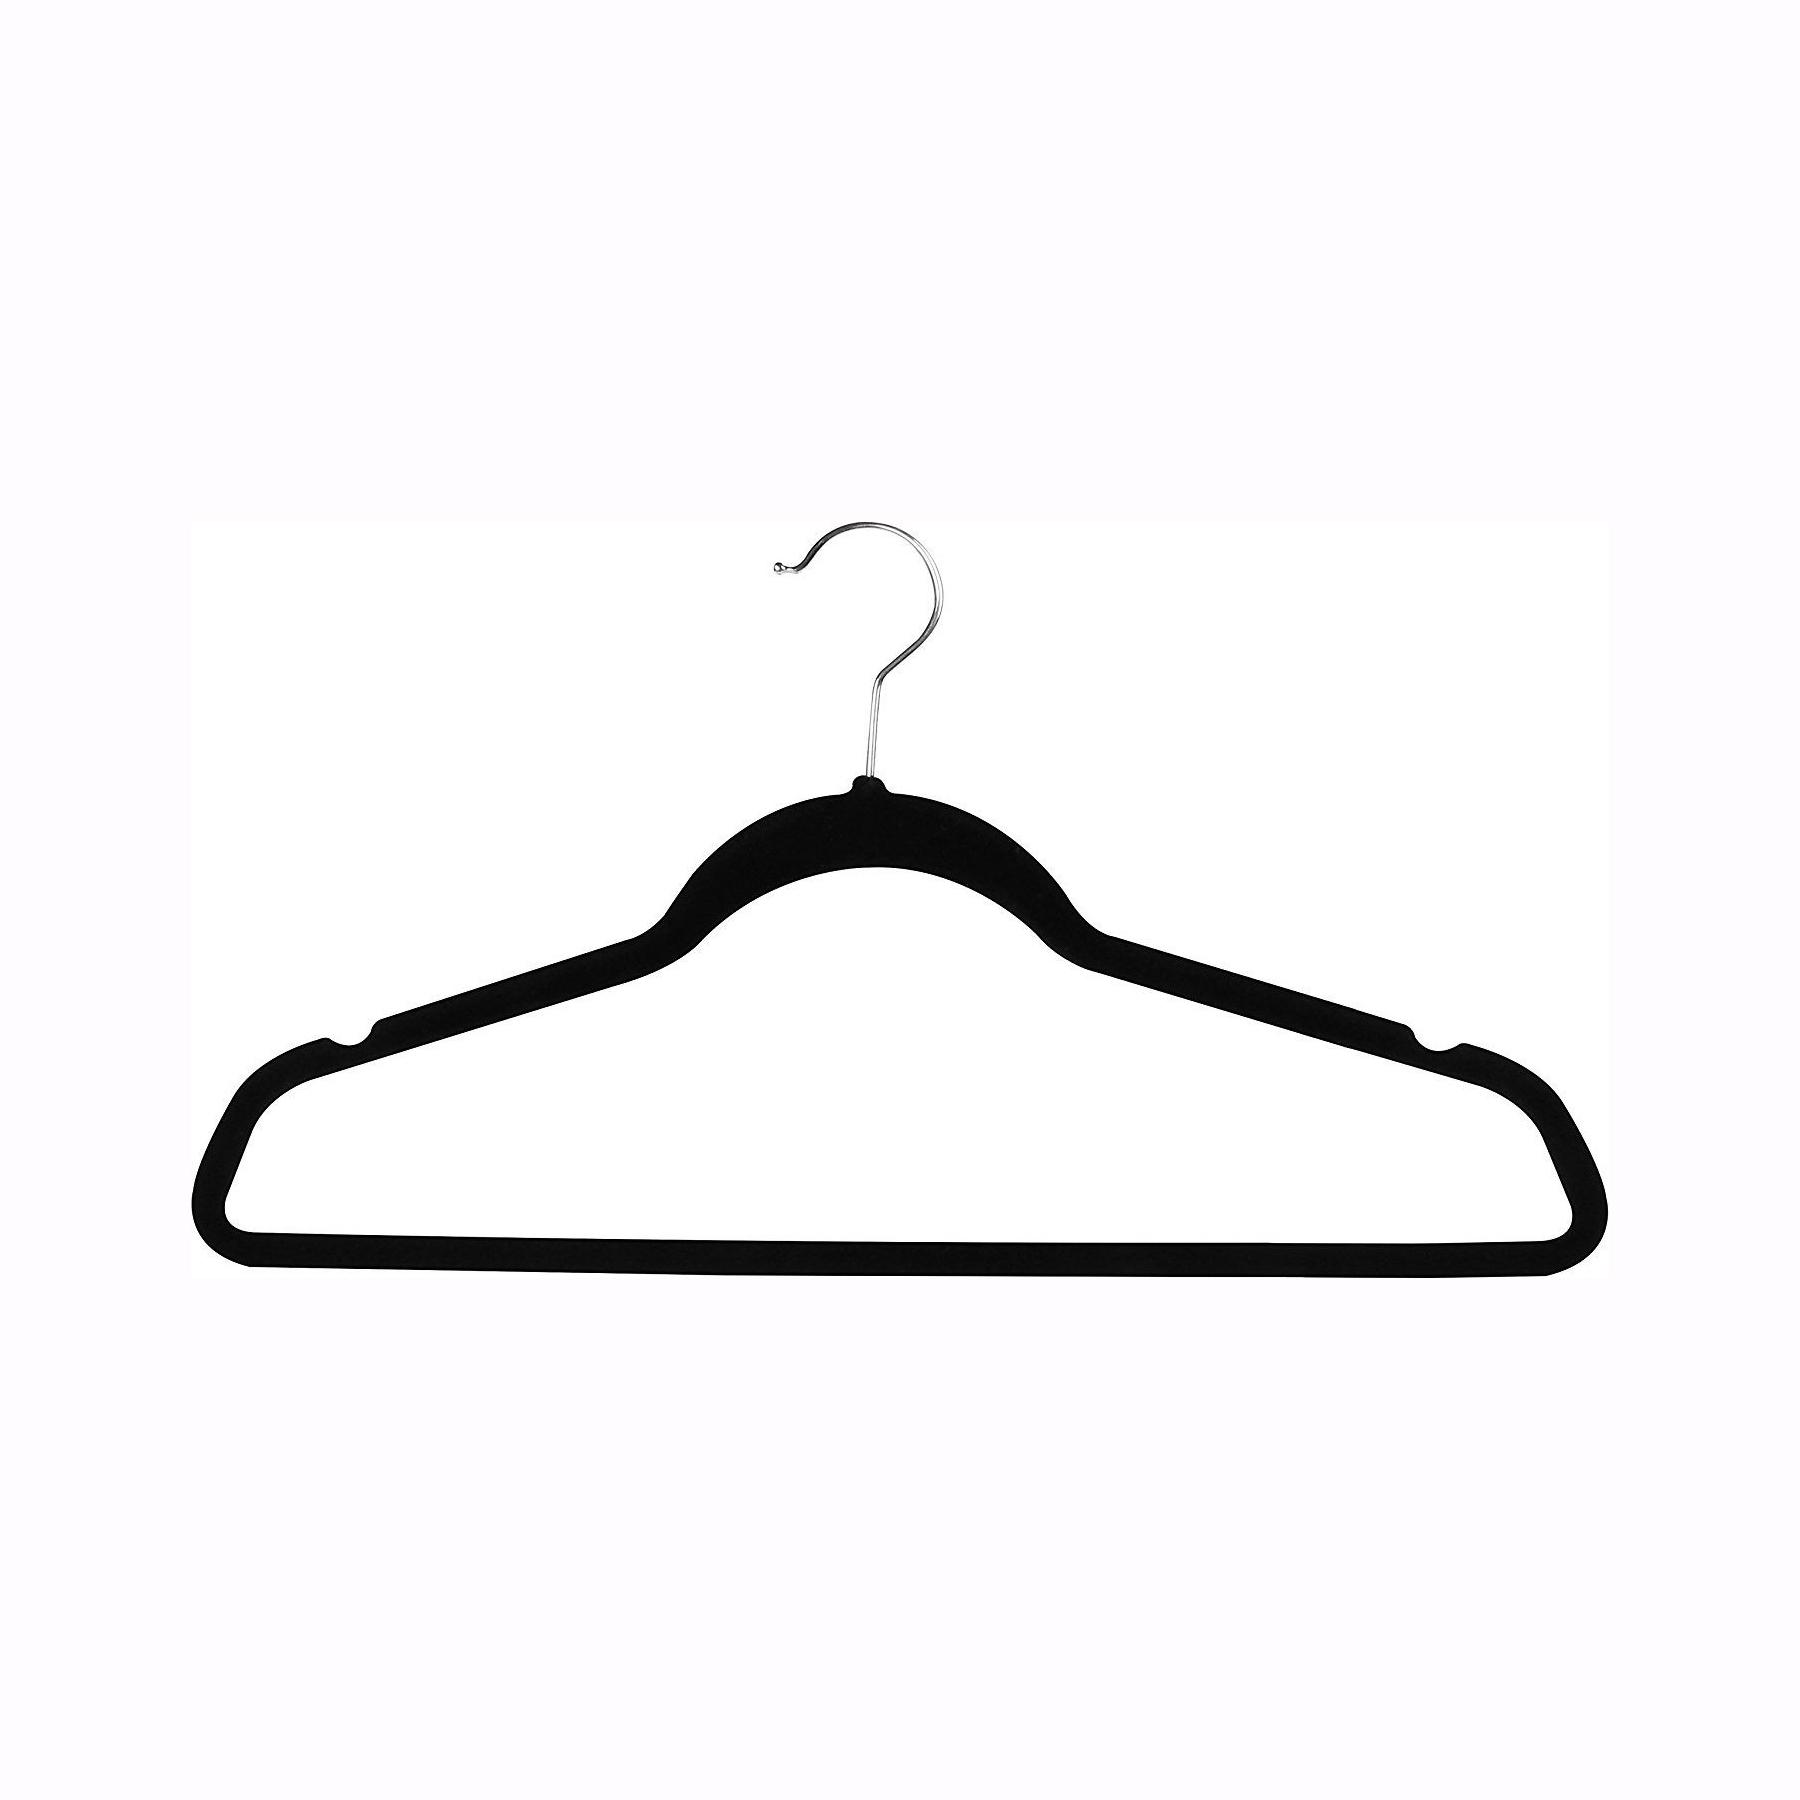 Wholesale Display & Merchandising (Many are Free) Black Velvet Hangers -